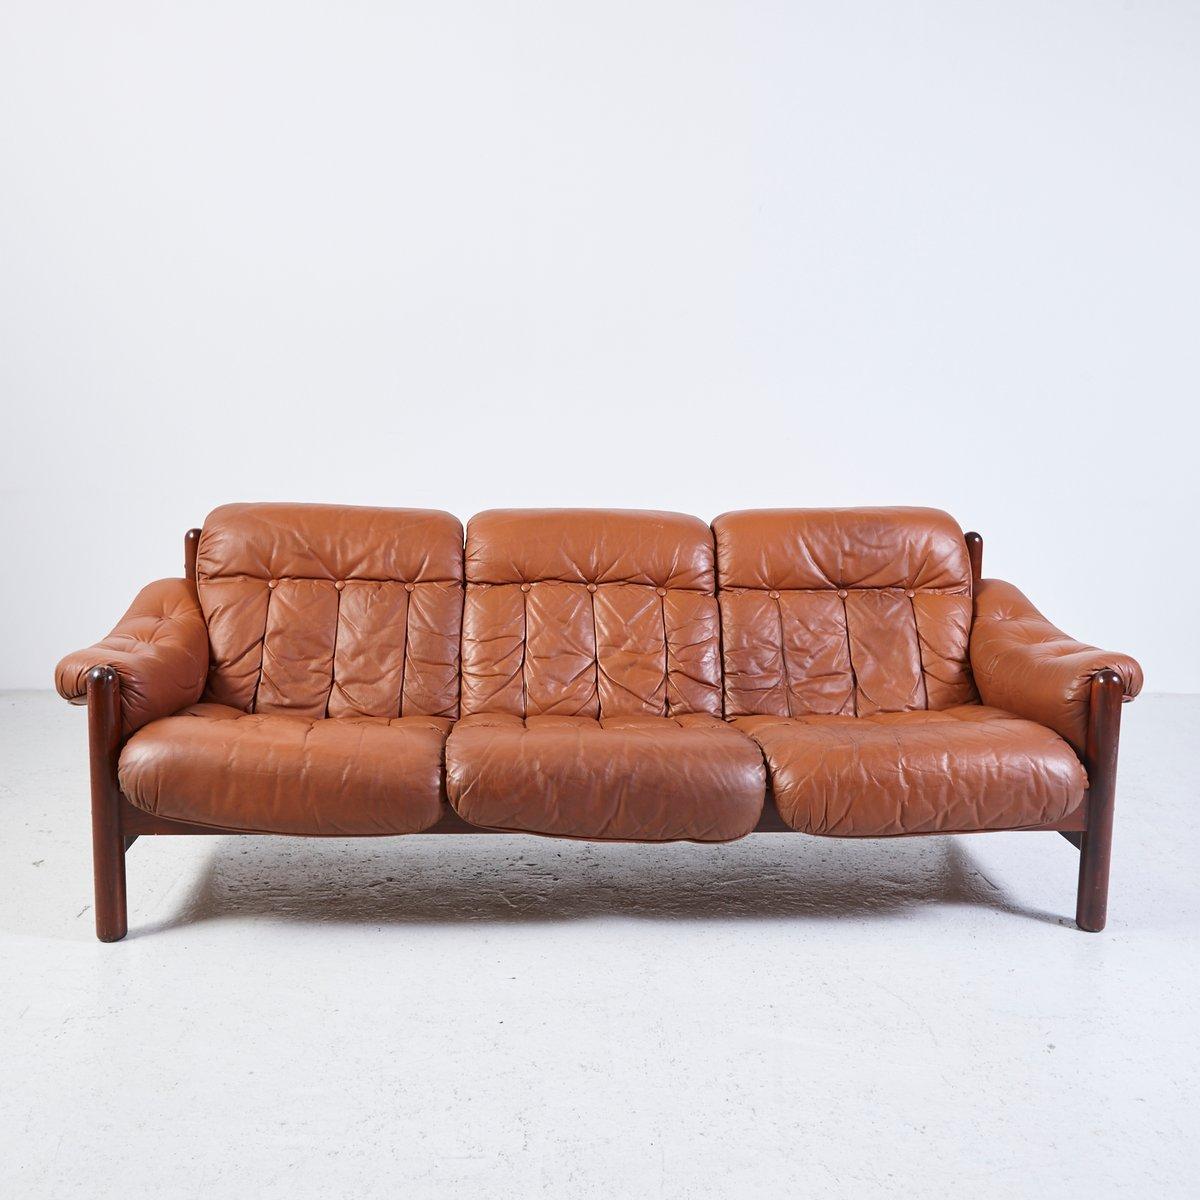 Vintage 3 Seater Leather Sofa With Teak Frame